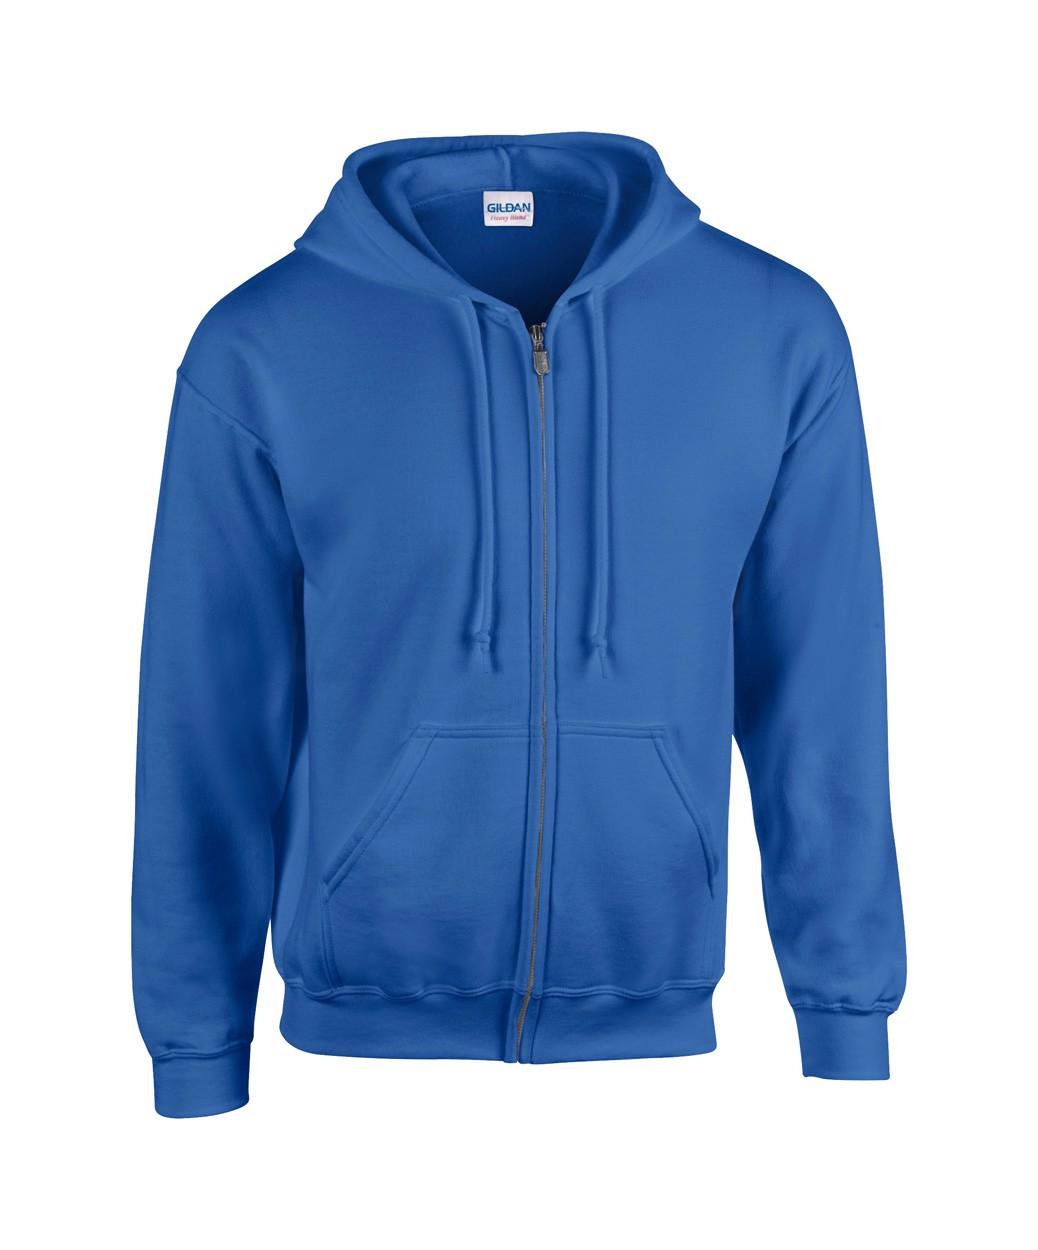 Mikina HB Zip Hooded - Modrá / L